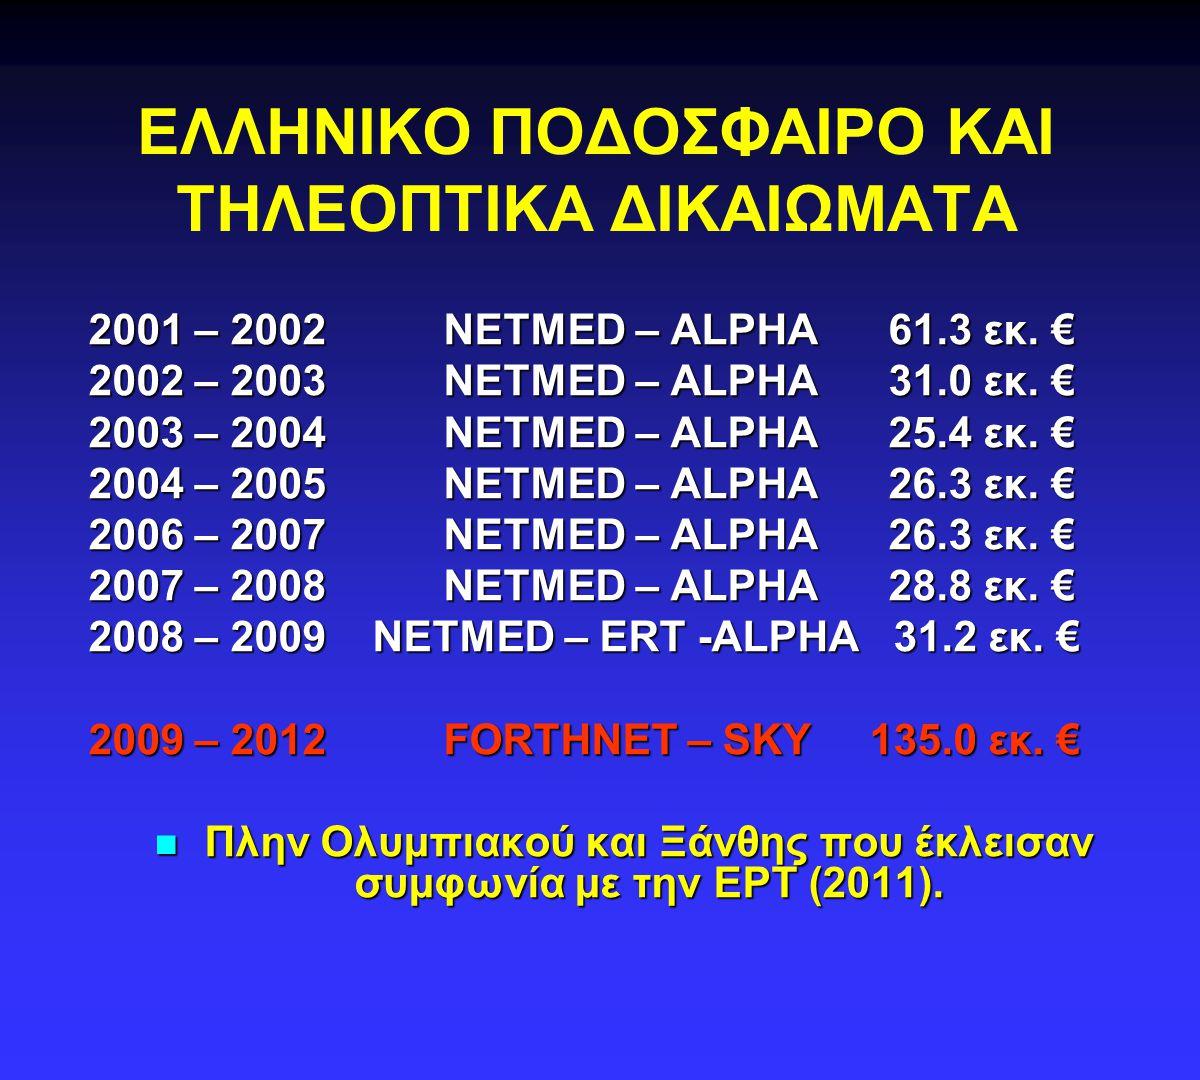 2001 – 2002 NETMED – ALPHA 61.3 εκ. € 2002 – 2003 NETMED – ALPHA 31.0 εκ. € 2003 – 2004 NETMED – ALPHA 25.4 εκ. € 2004 – 2005 NETMED – ALPHA 26.3 εκ.